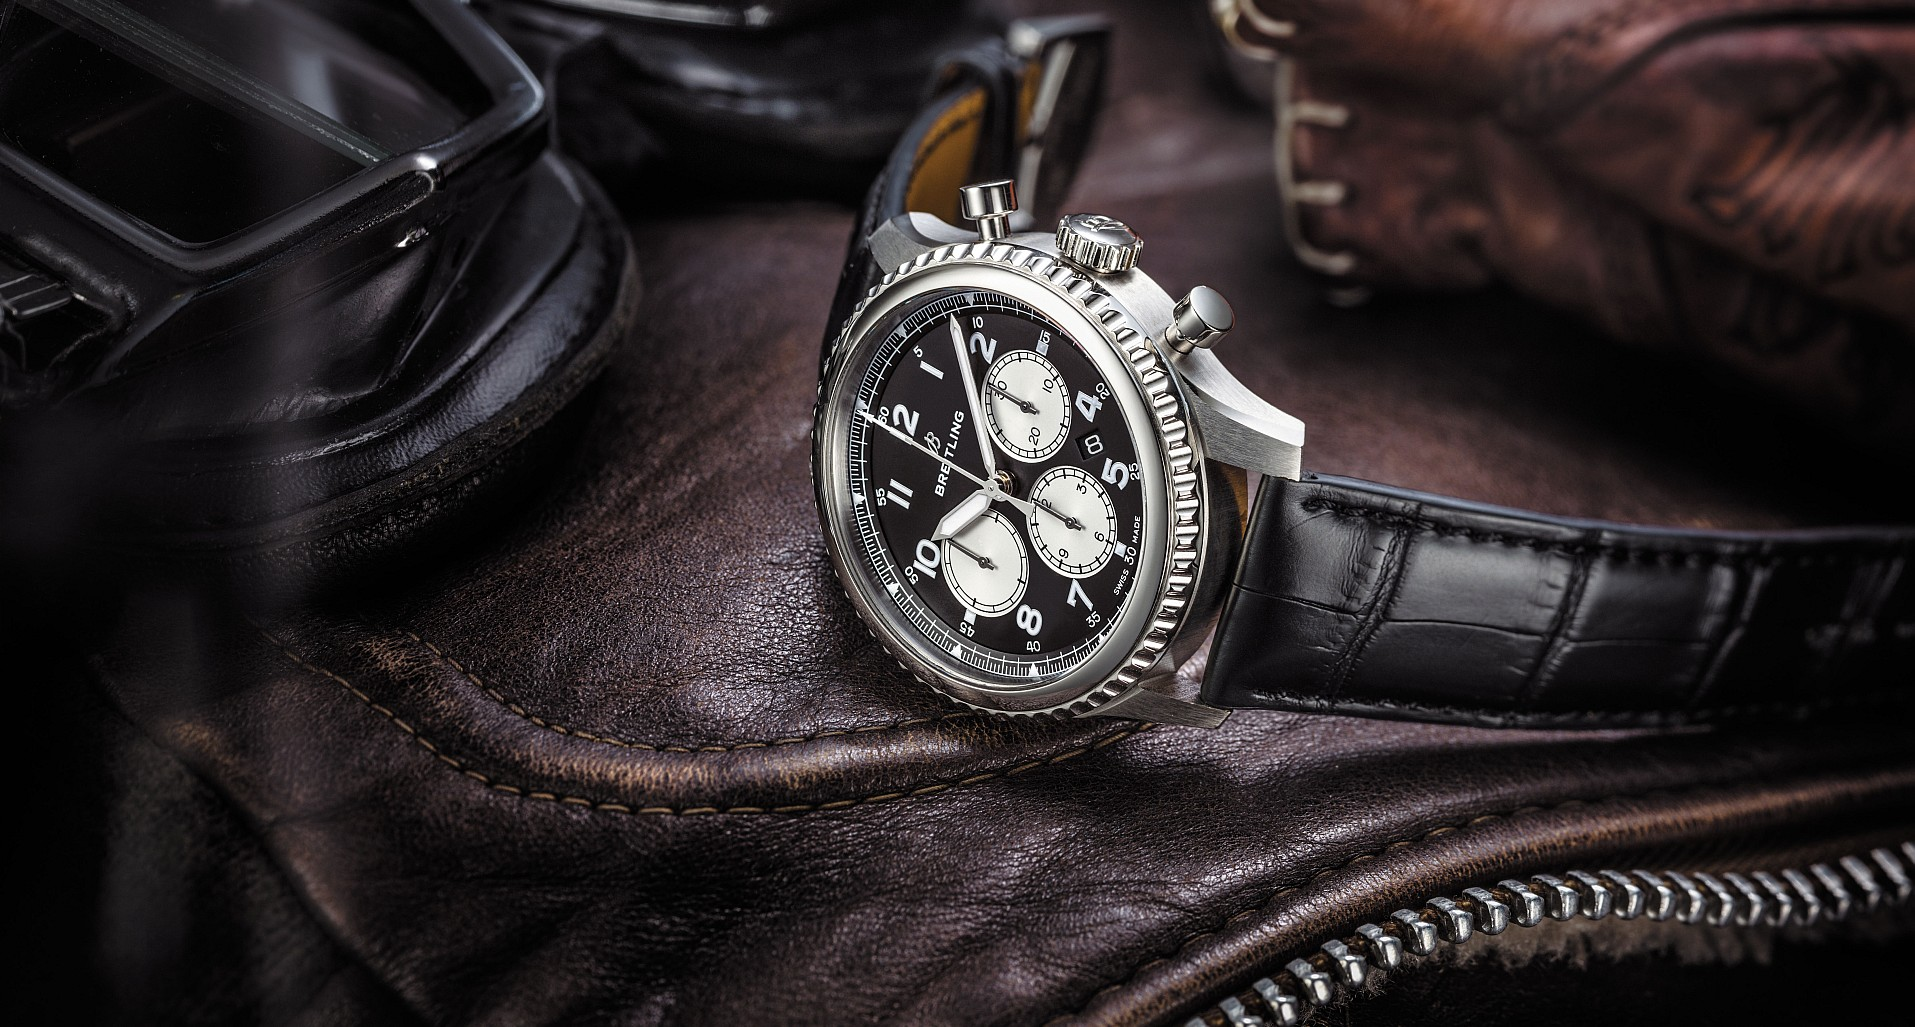 【2018 BASEL錶展報導】百年靈NAVITIMER 8航空計時腕錶系列